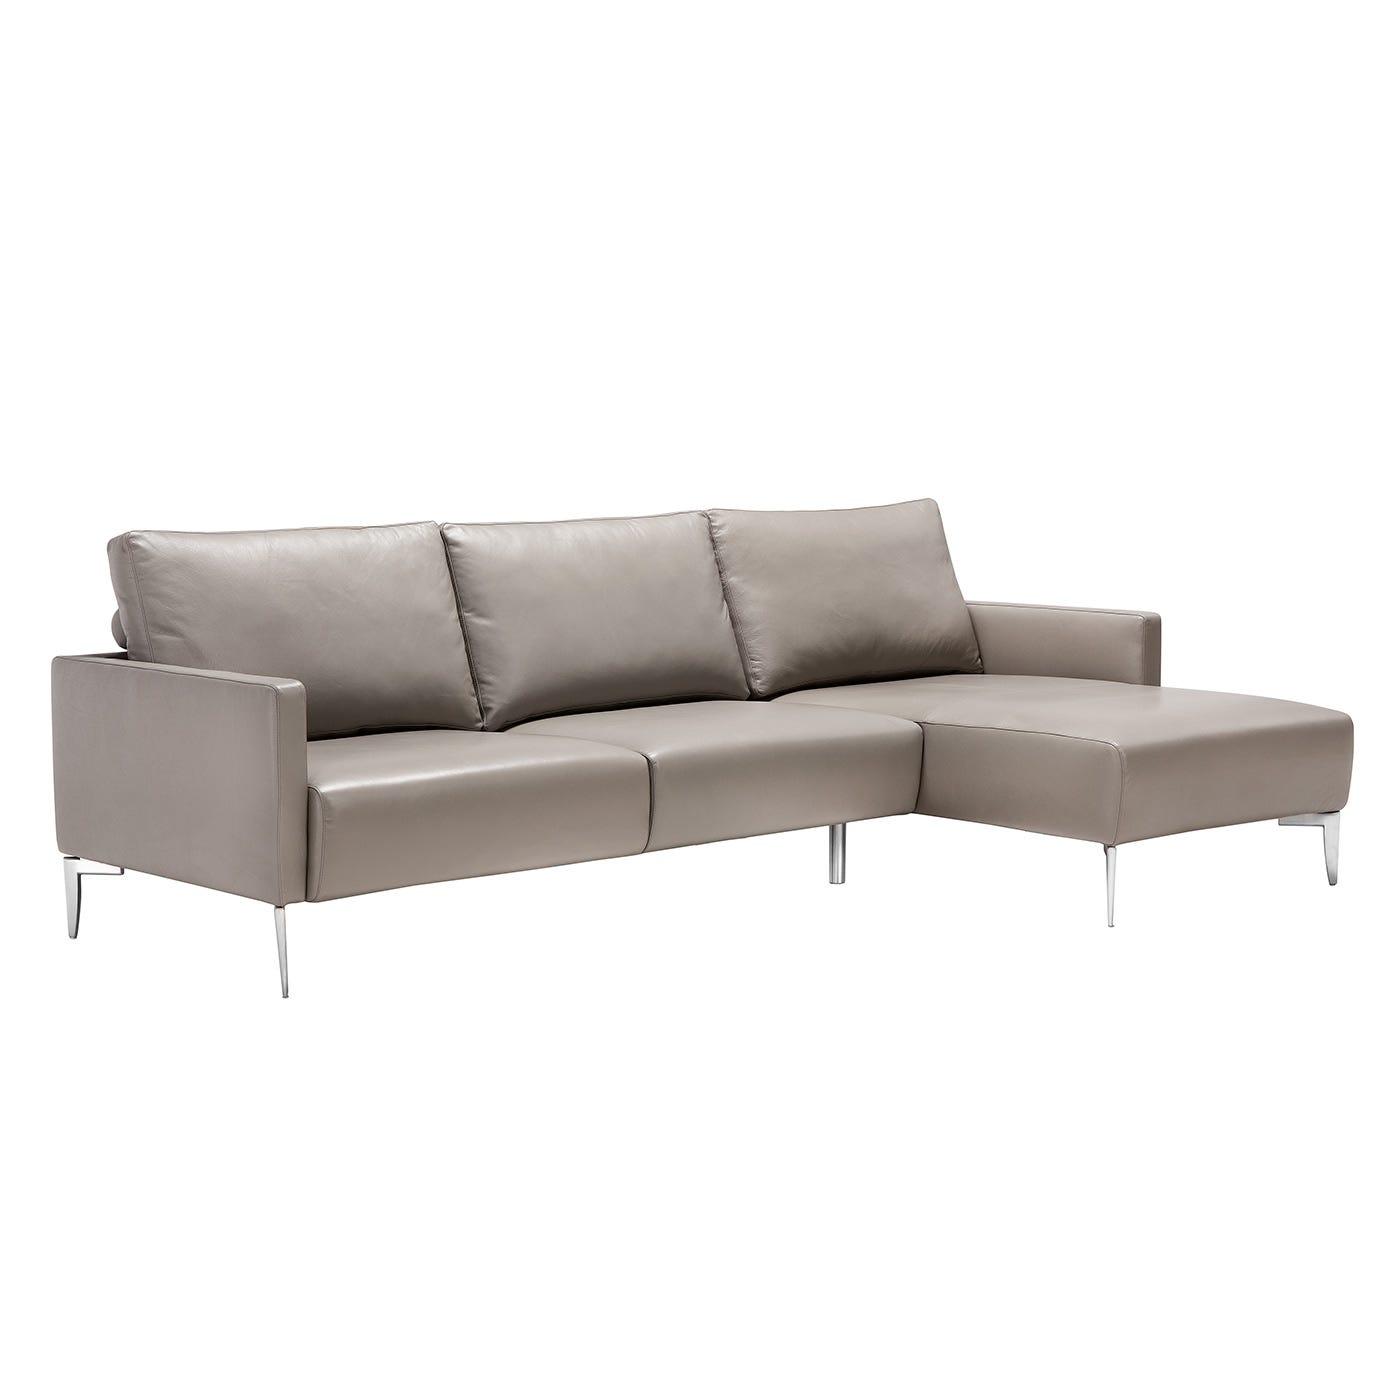 Amalfi Right Hand Facing Corner Sofa